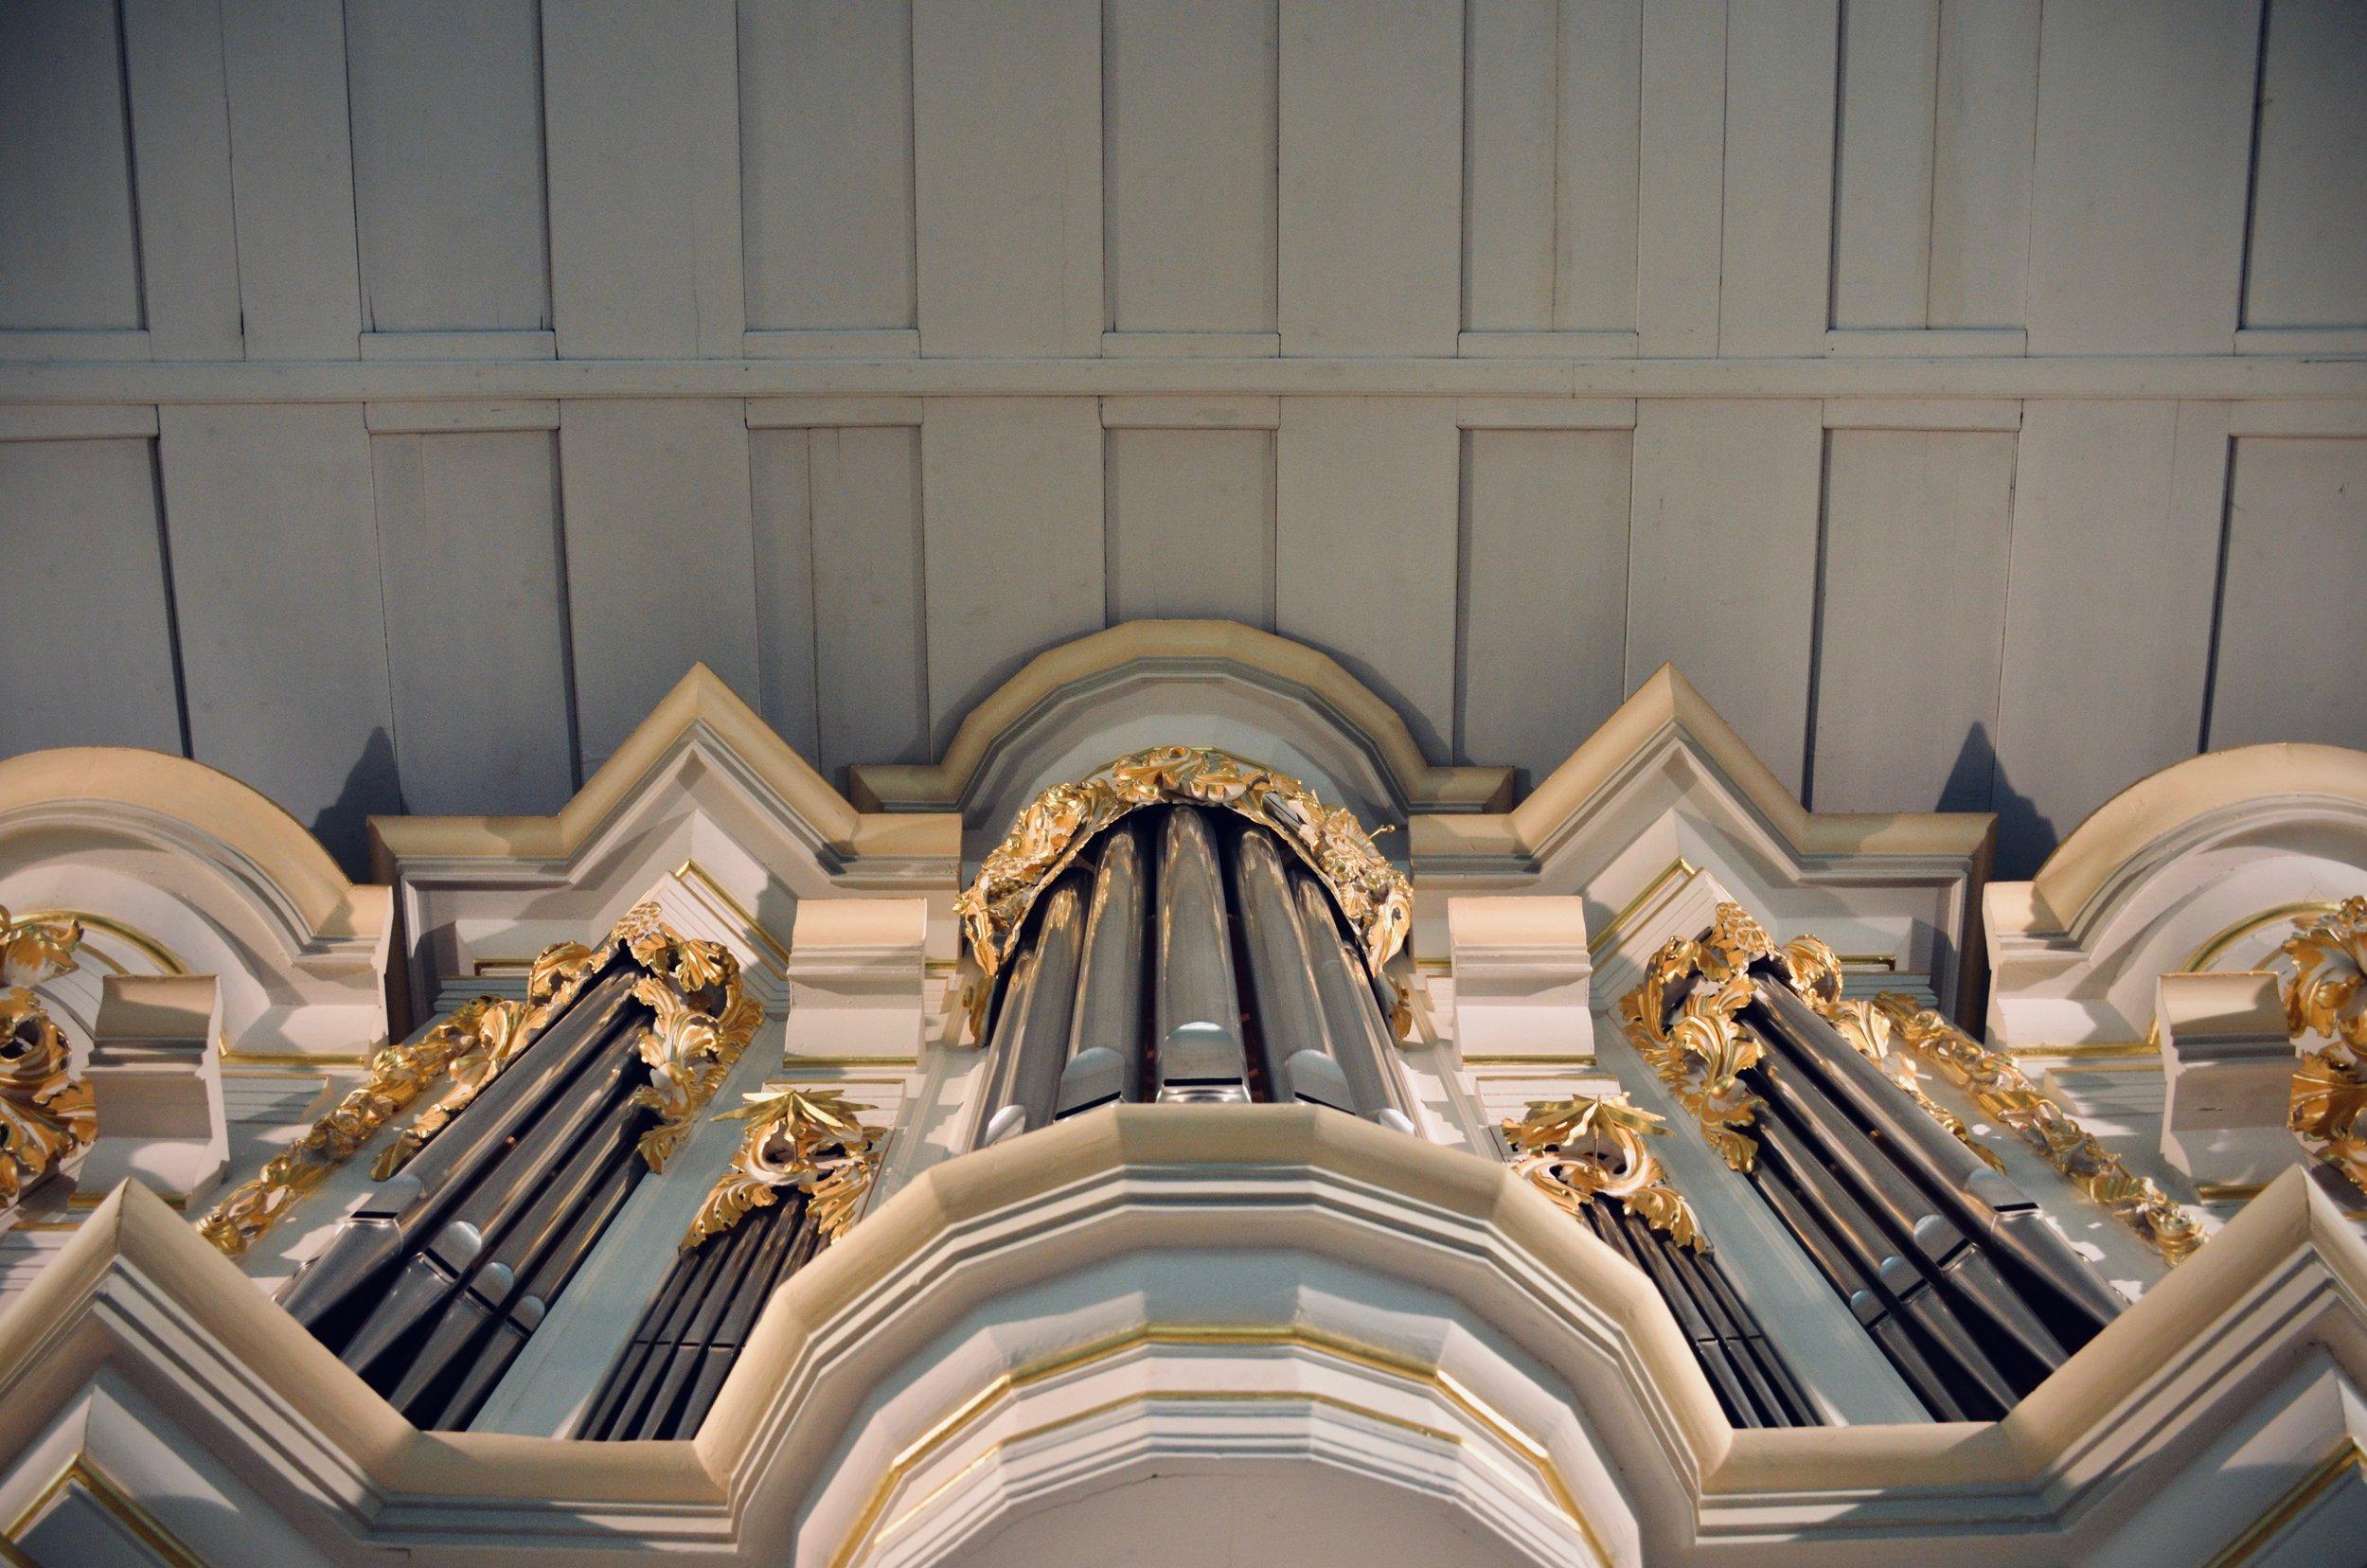 Reconstructed Wender Organ (1703/2000) in Bachkirche, Arnstadt.